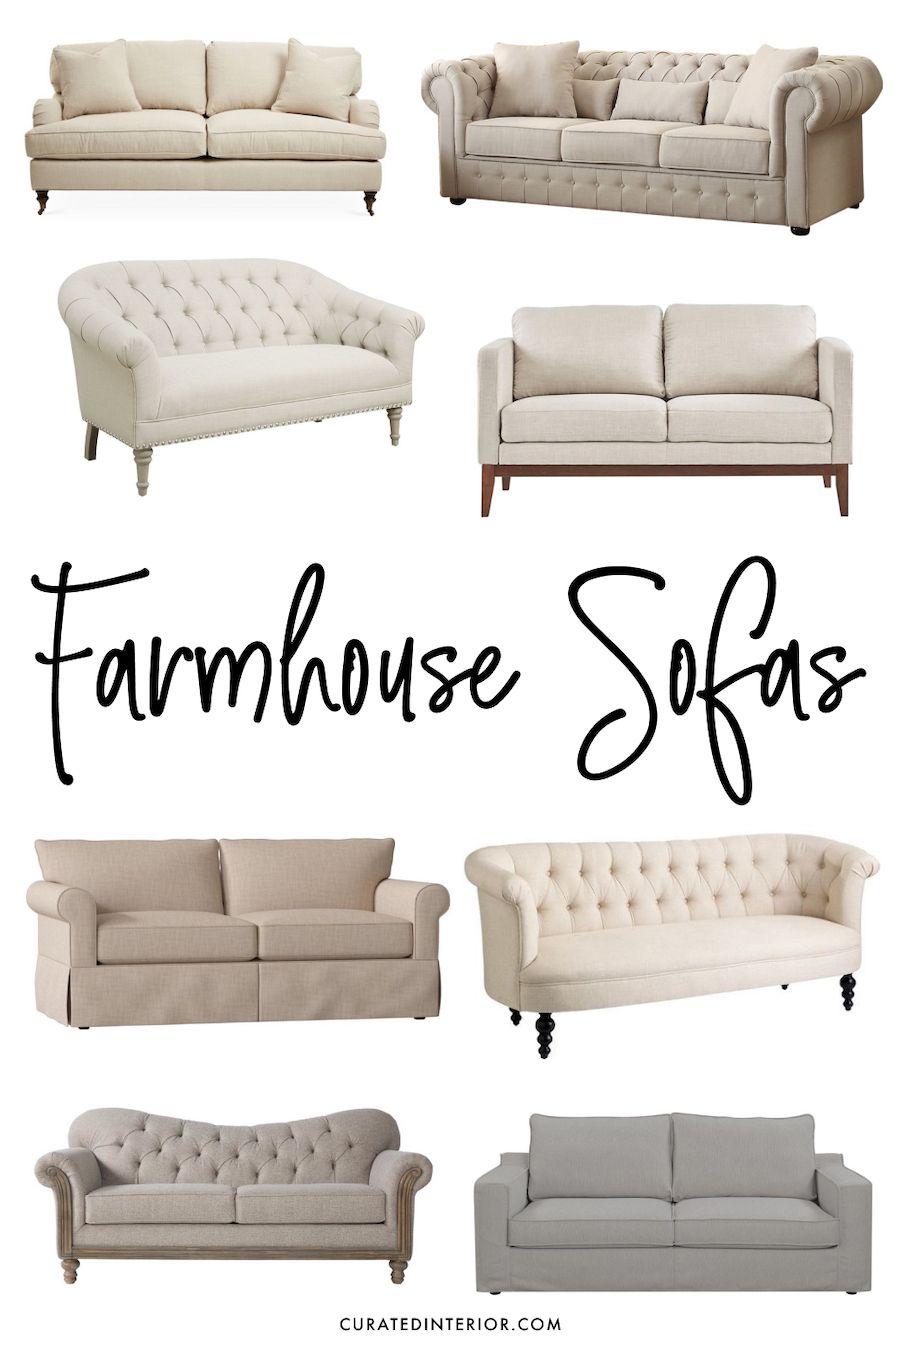 12 Perfect Farmhouse Sofas For All Budgets Farmhouse Style